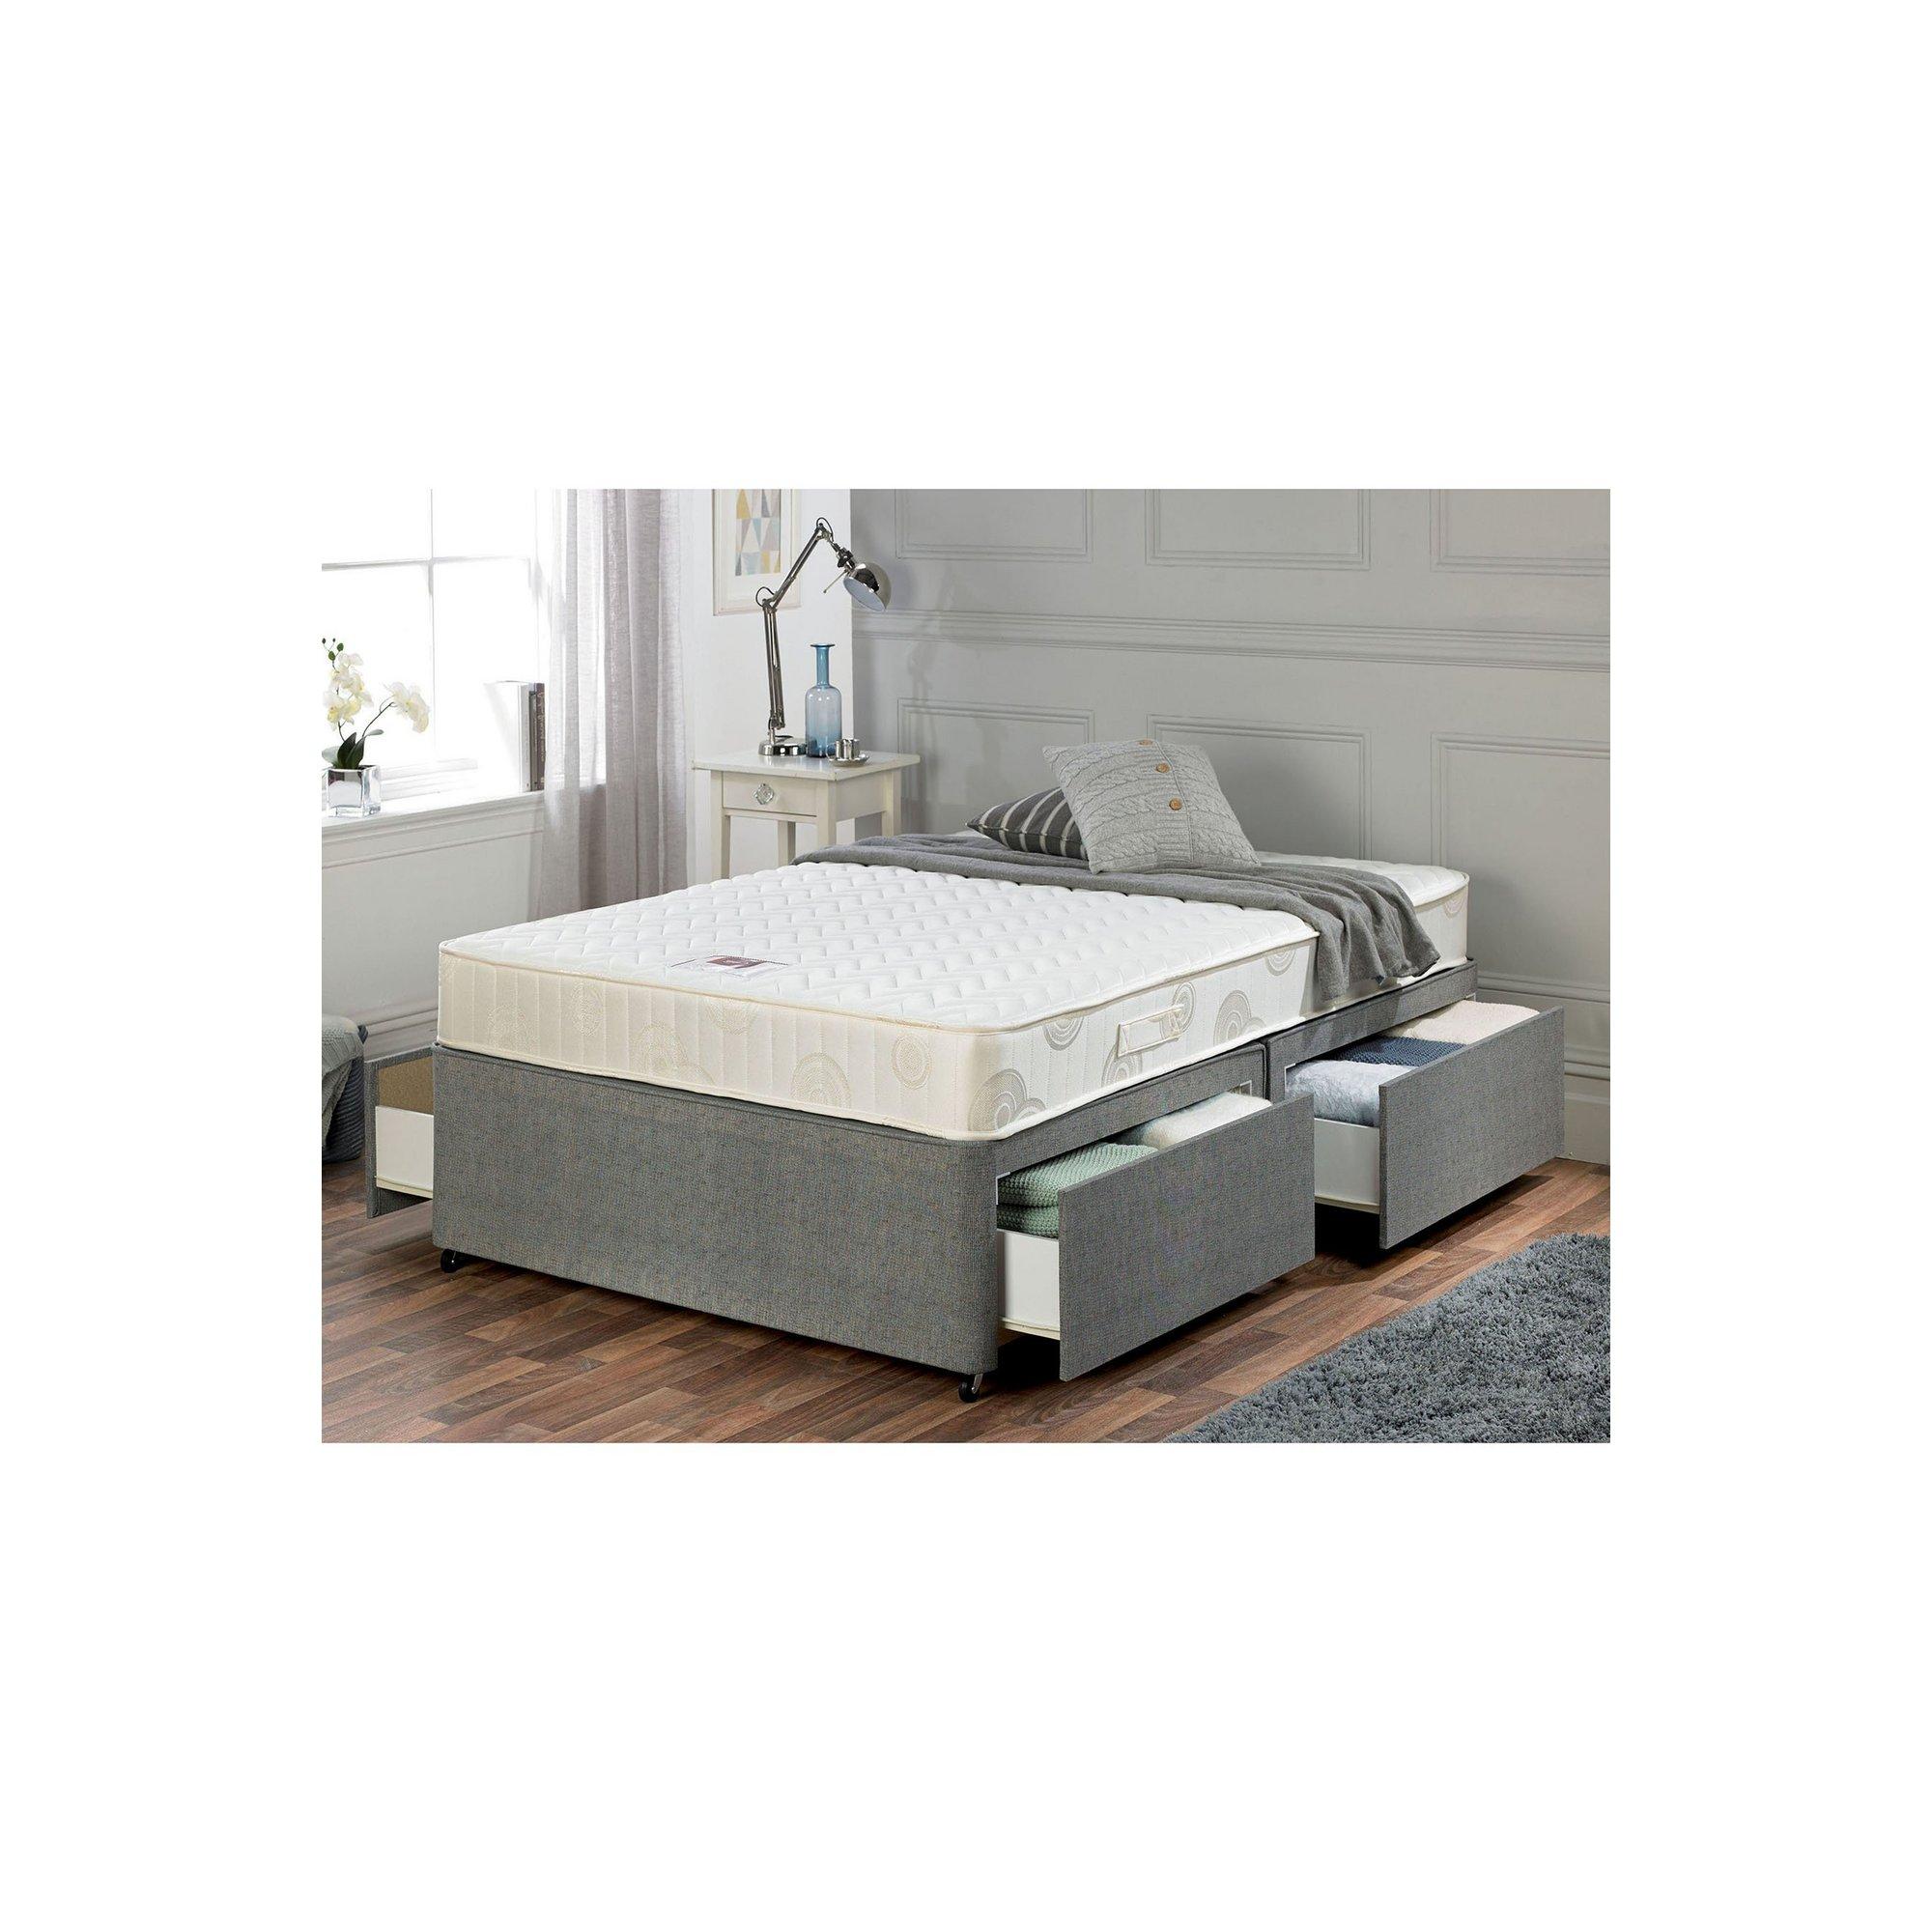 Image of Airsprung Memory Flex Divan Bed - 4 Drawer Storage